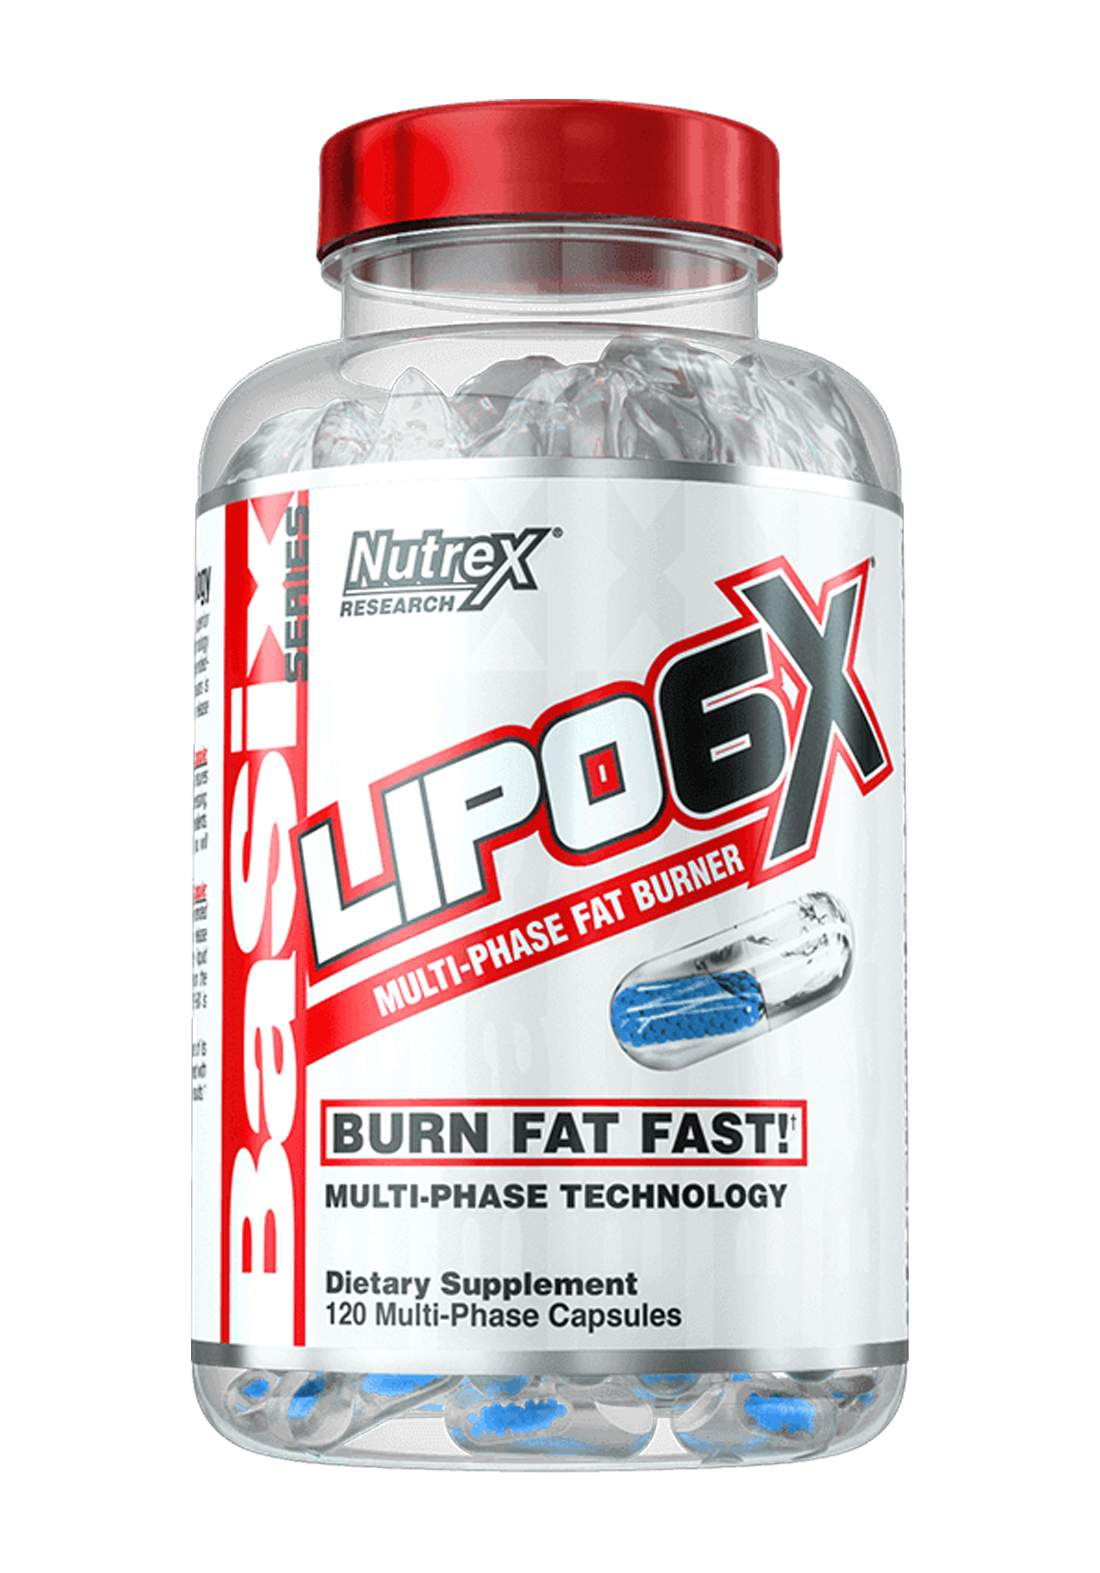 Nutrex Research Lipo-6  Multi-Phase Fat Burner 120 Capsules مكمل غذائي حارق للدهون